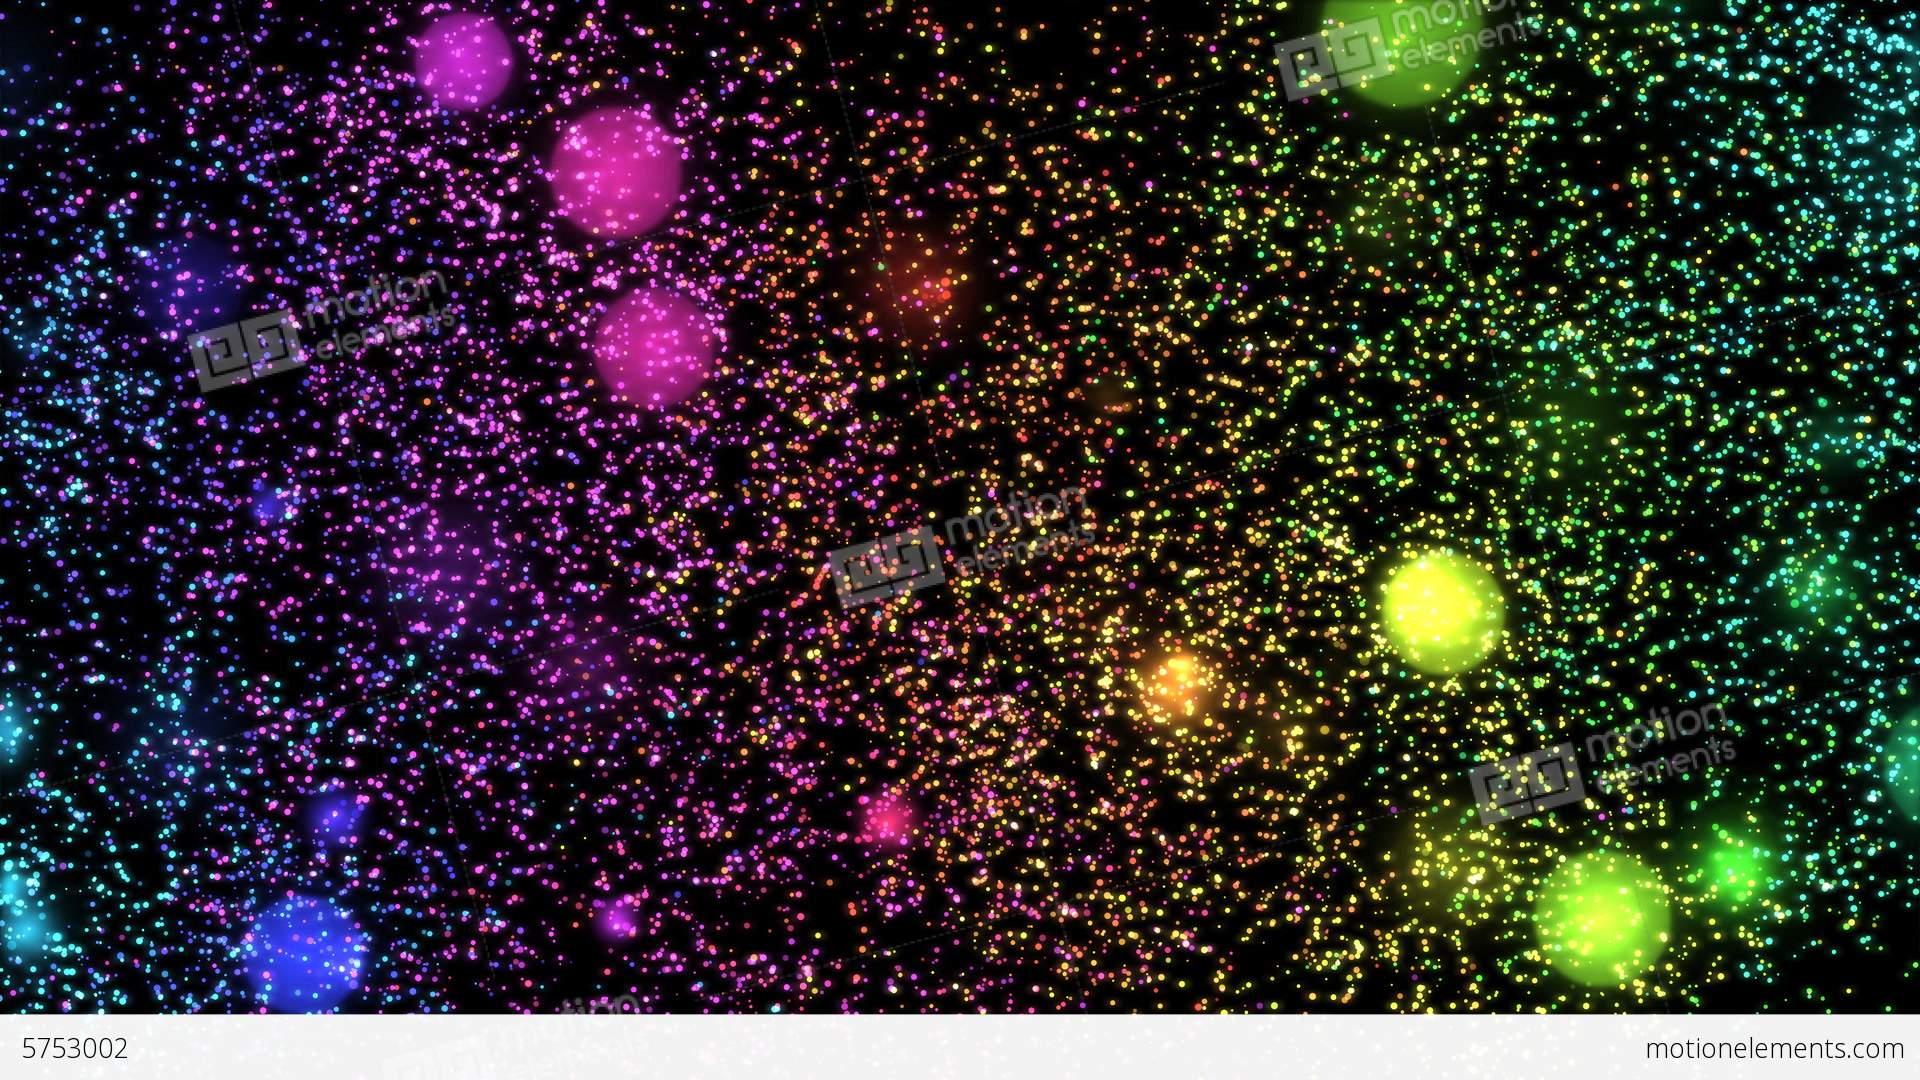 rainbow glider wallpaper - photo #17